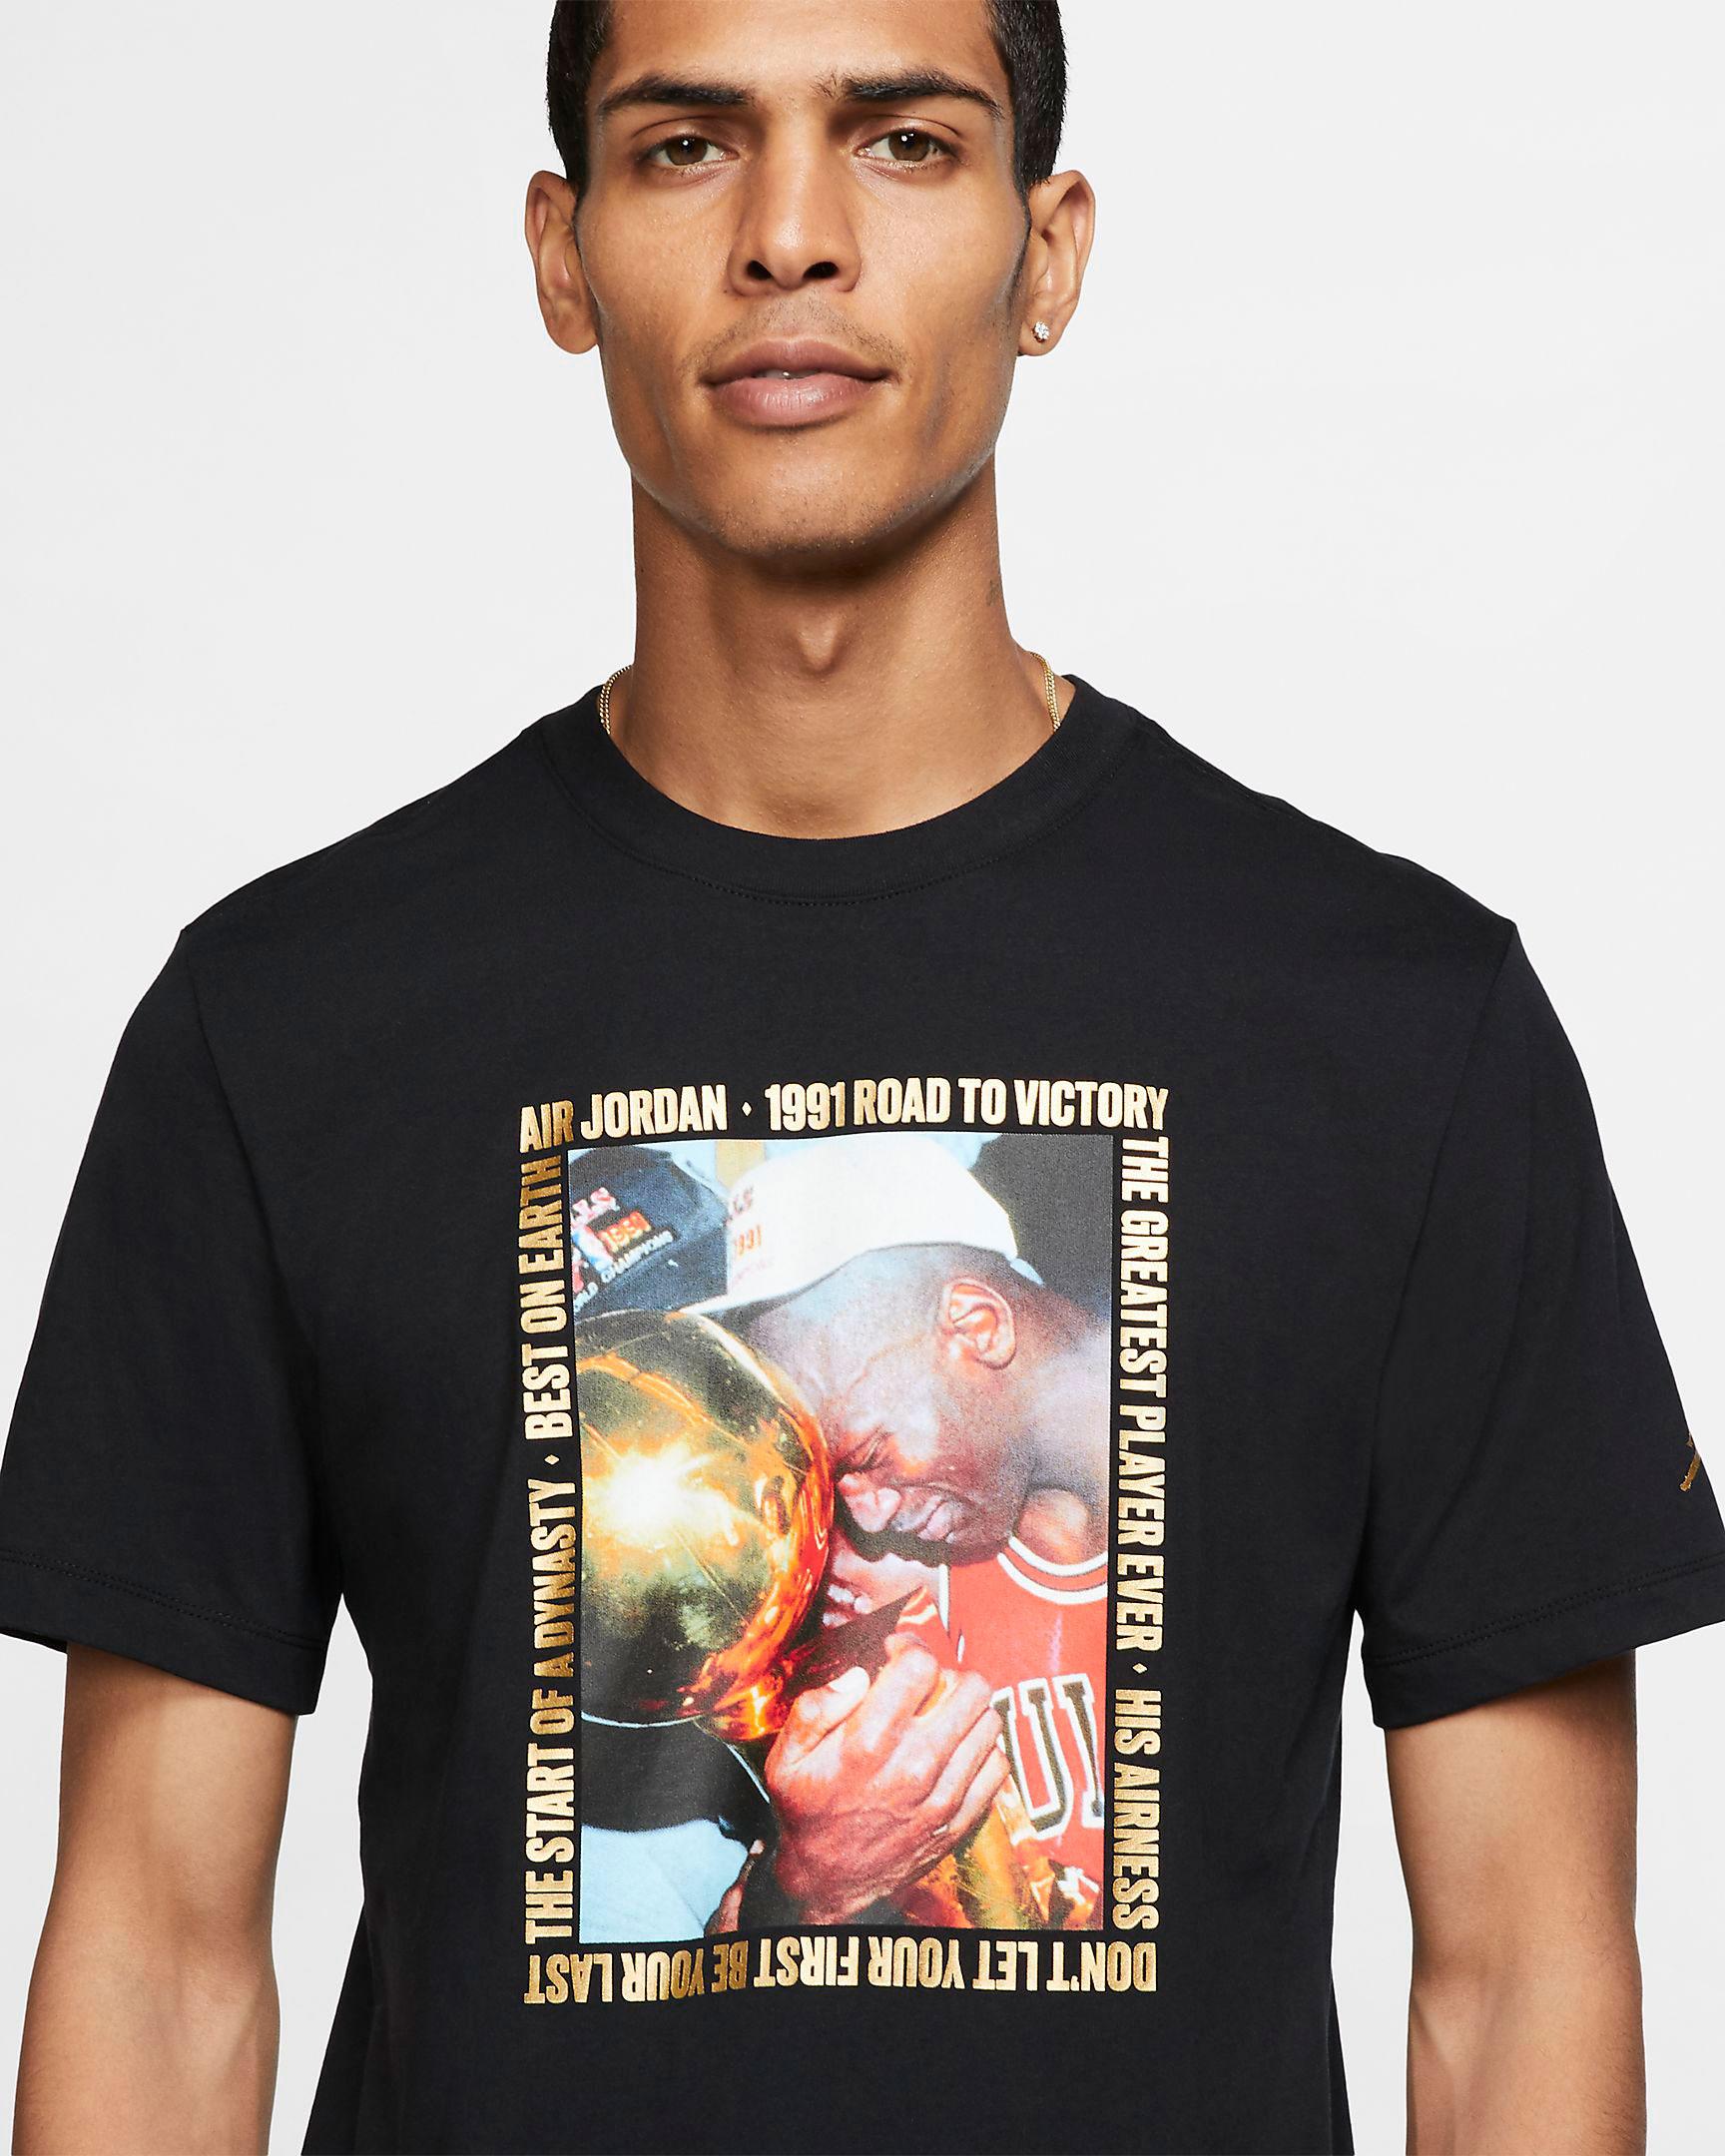 jordan-7-reflections-of-a-champion-shirt-1